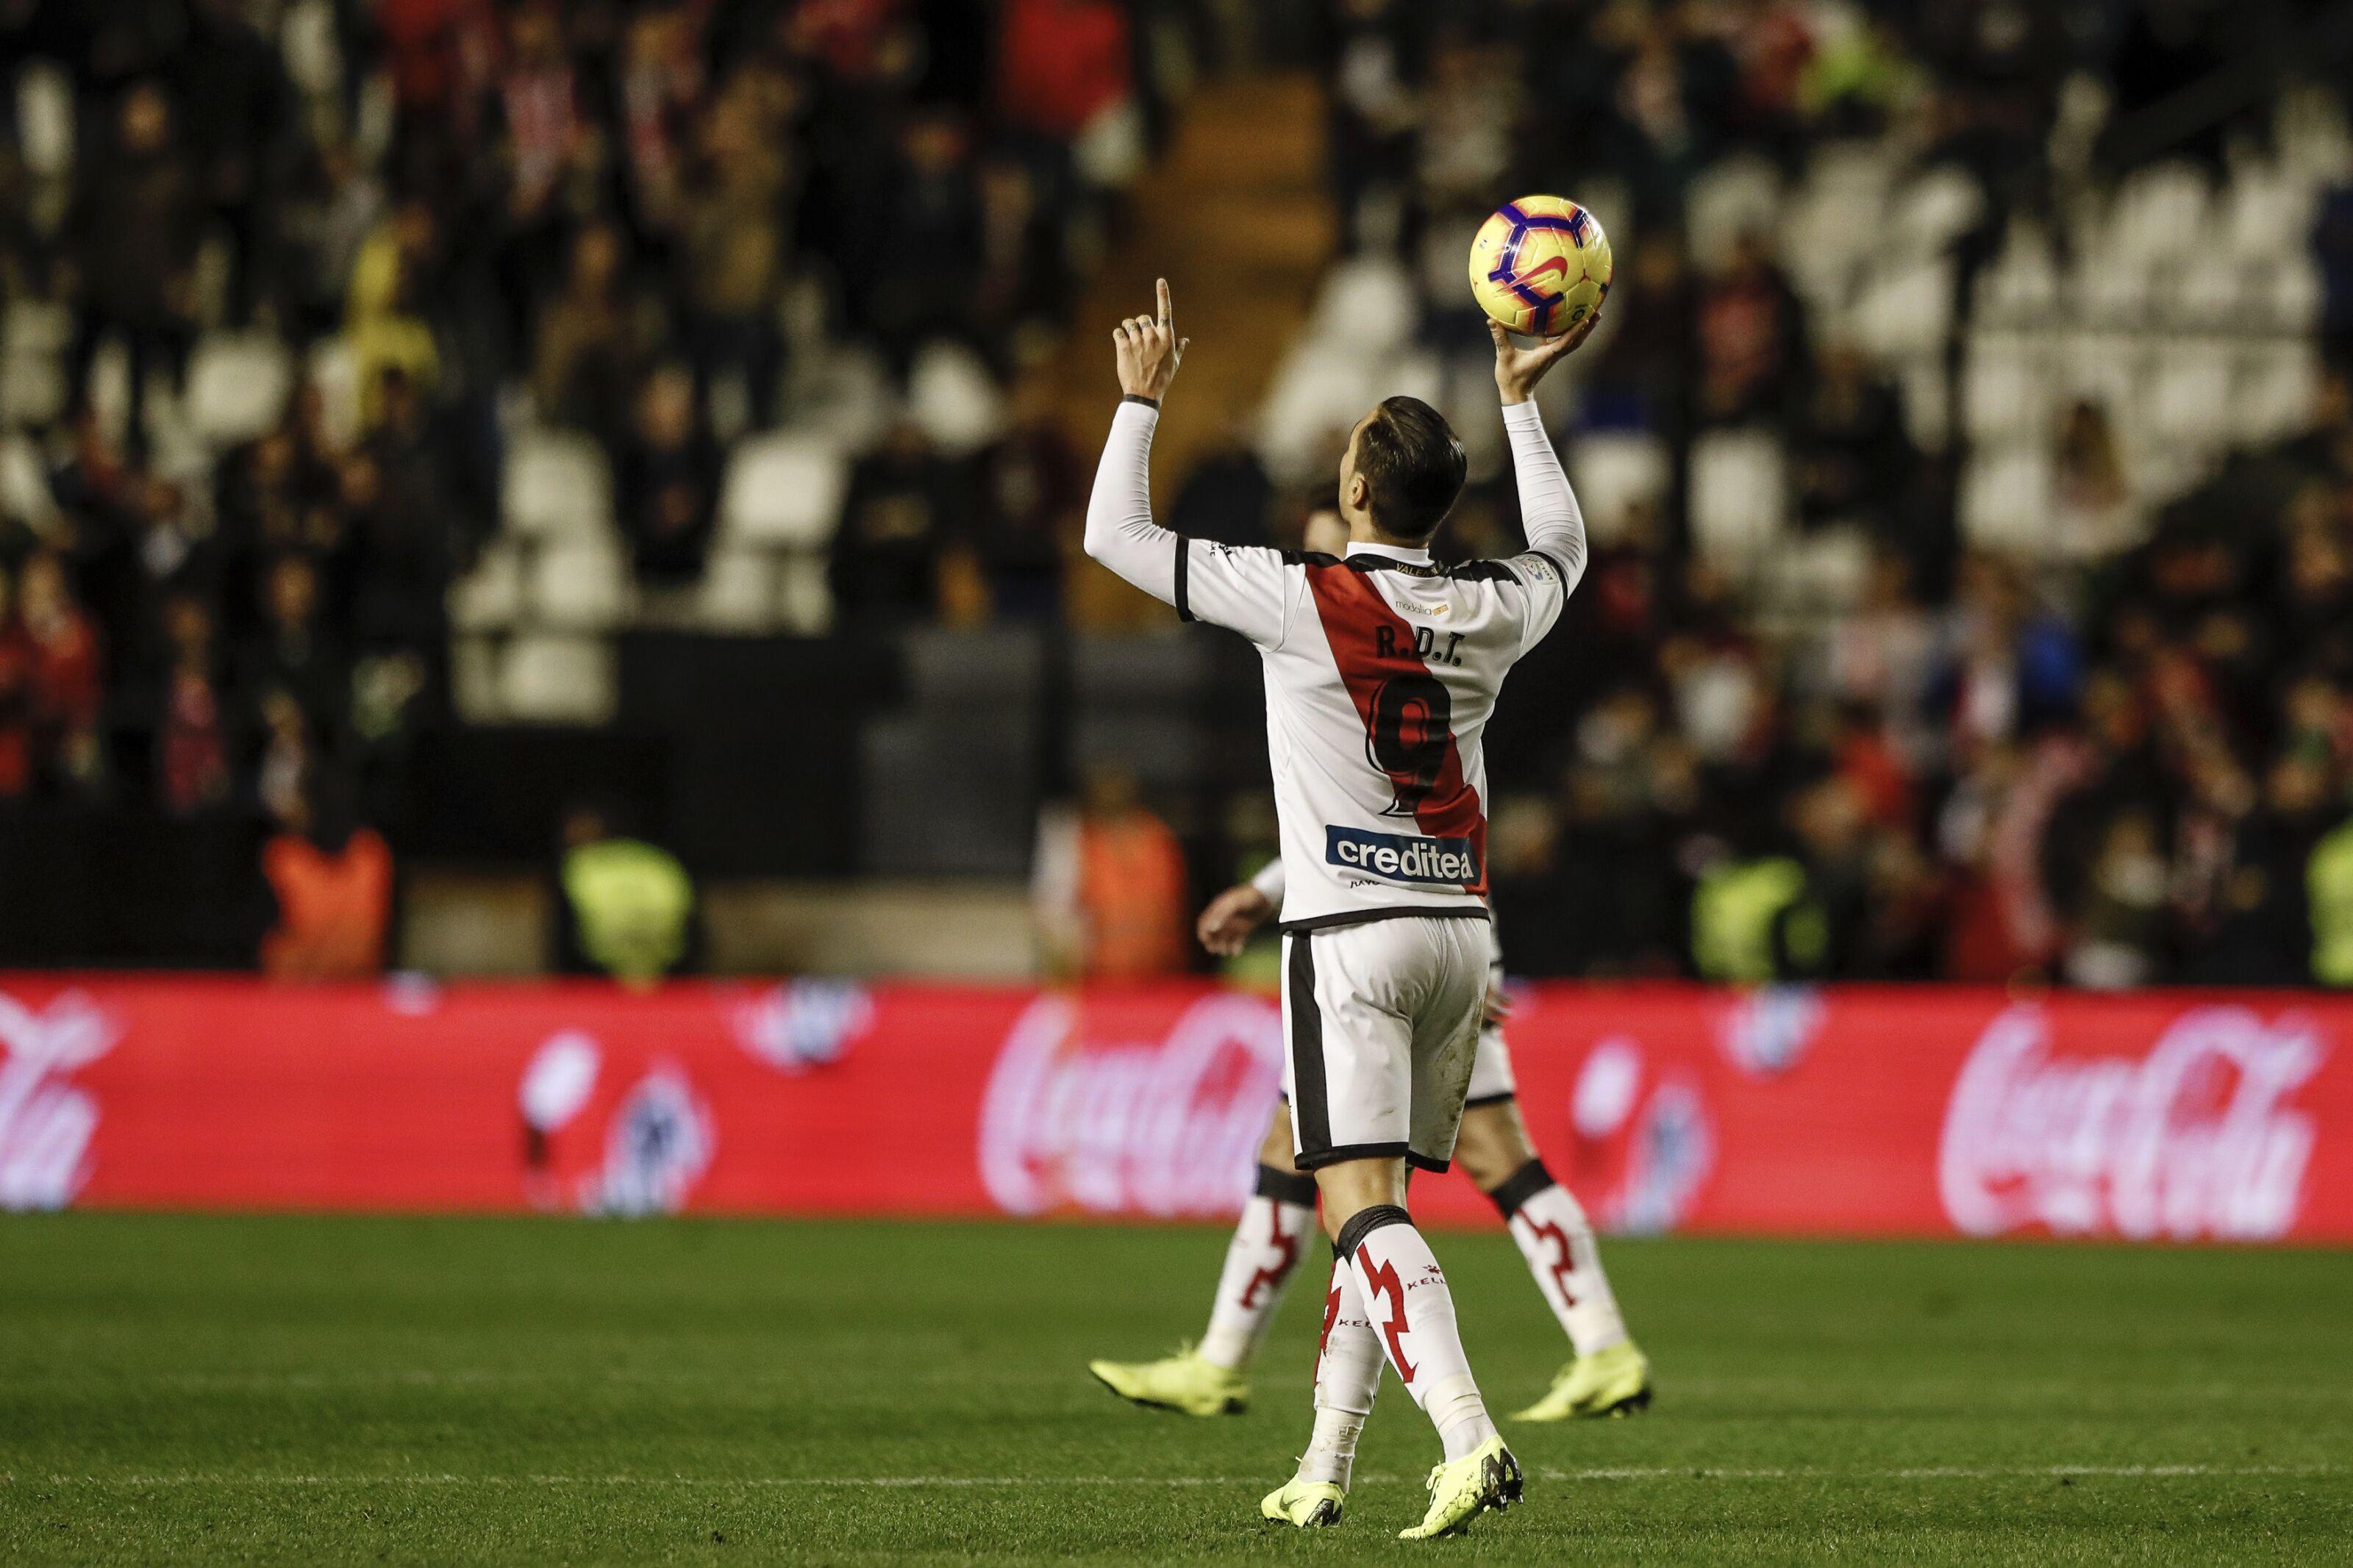 madrid players season play loan football rayo villareal role return three tomas vallecano getty